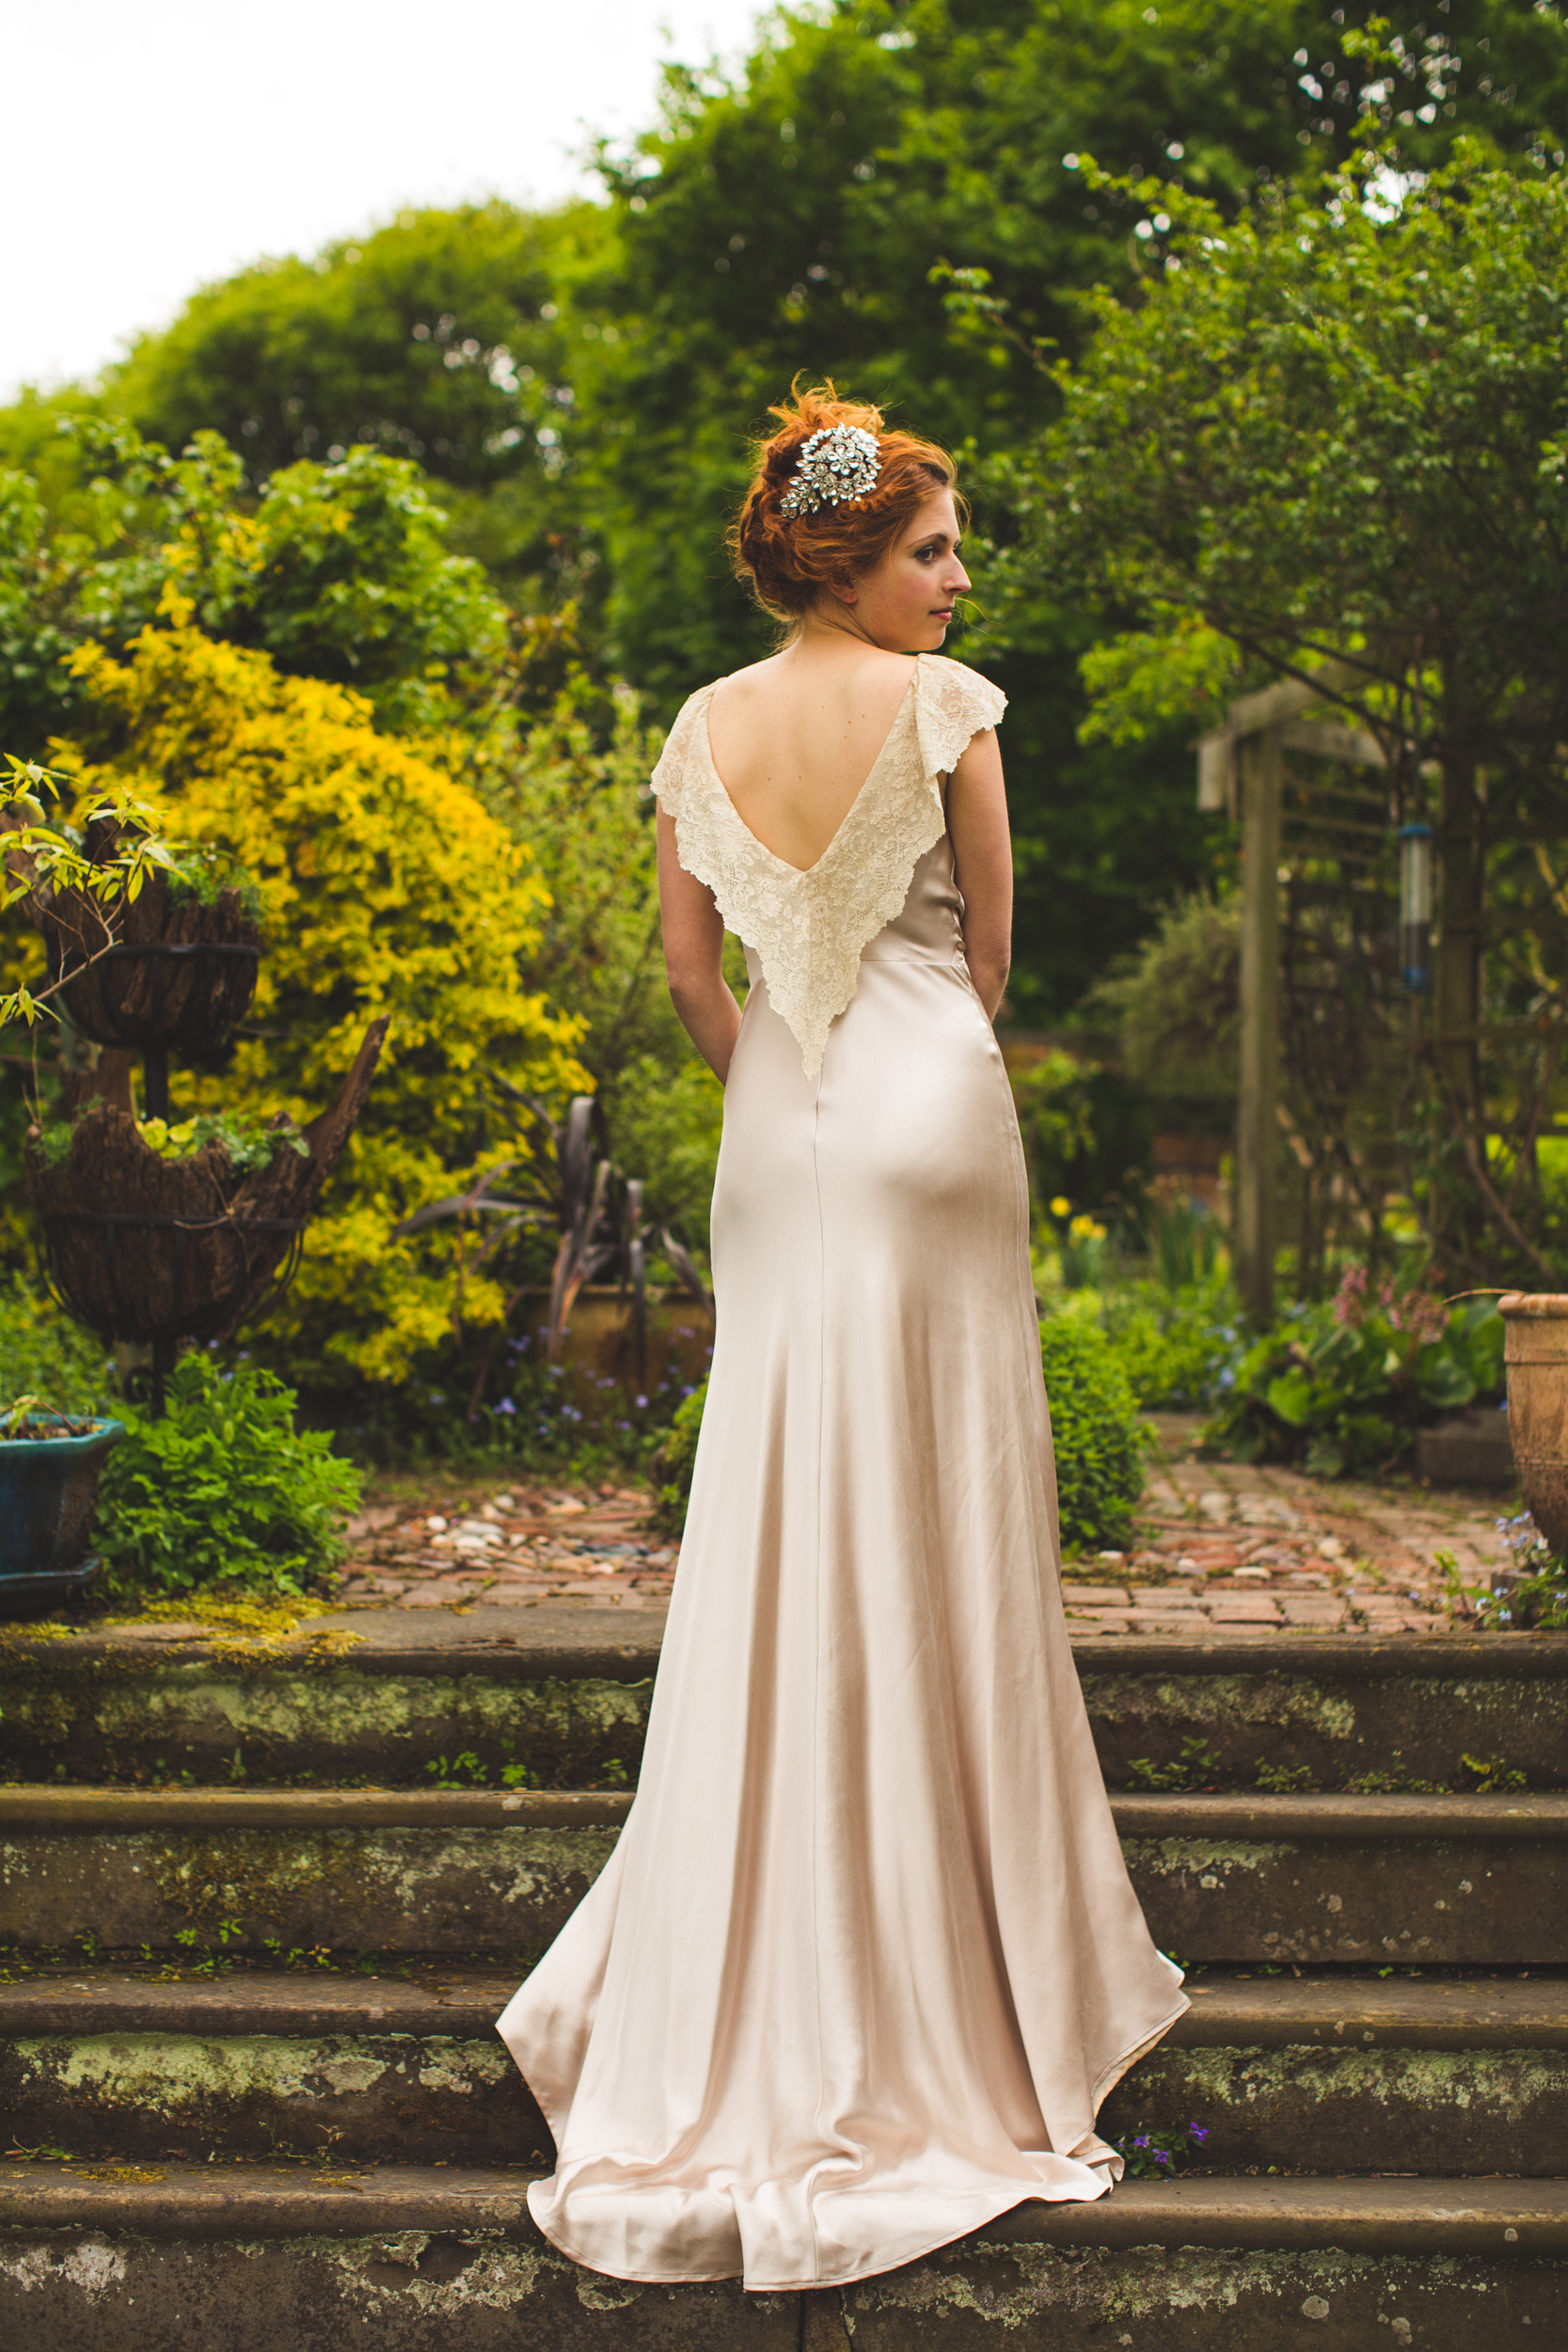 kate-beaumont-vintage-inspired-bridal-wedding-dresses-Sheffield-S6-24.jpg